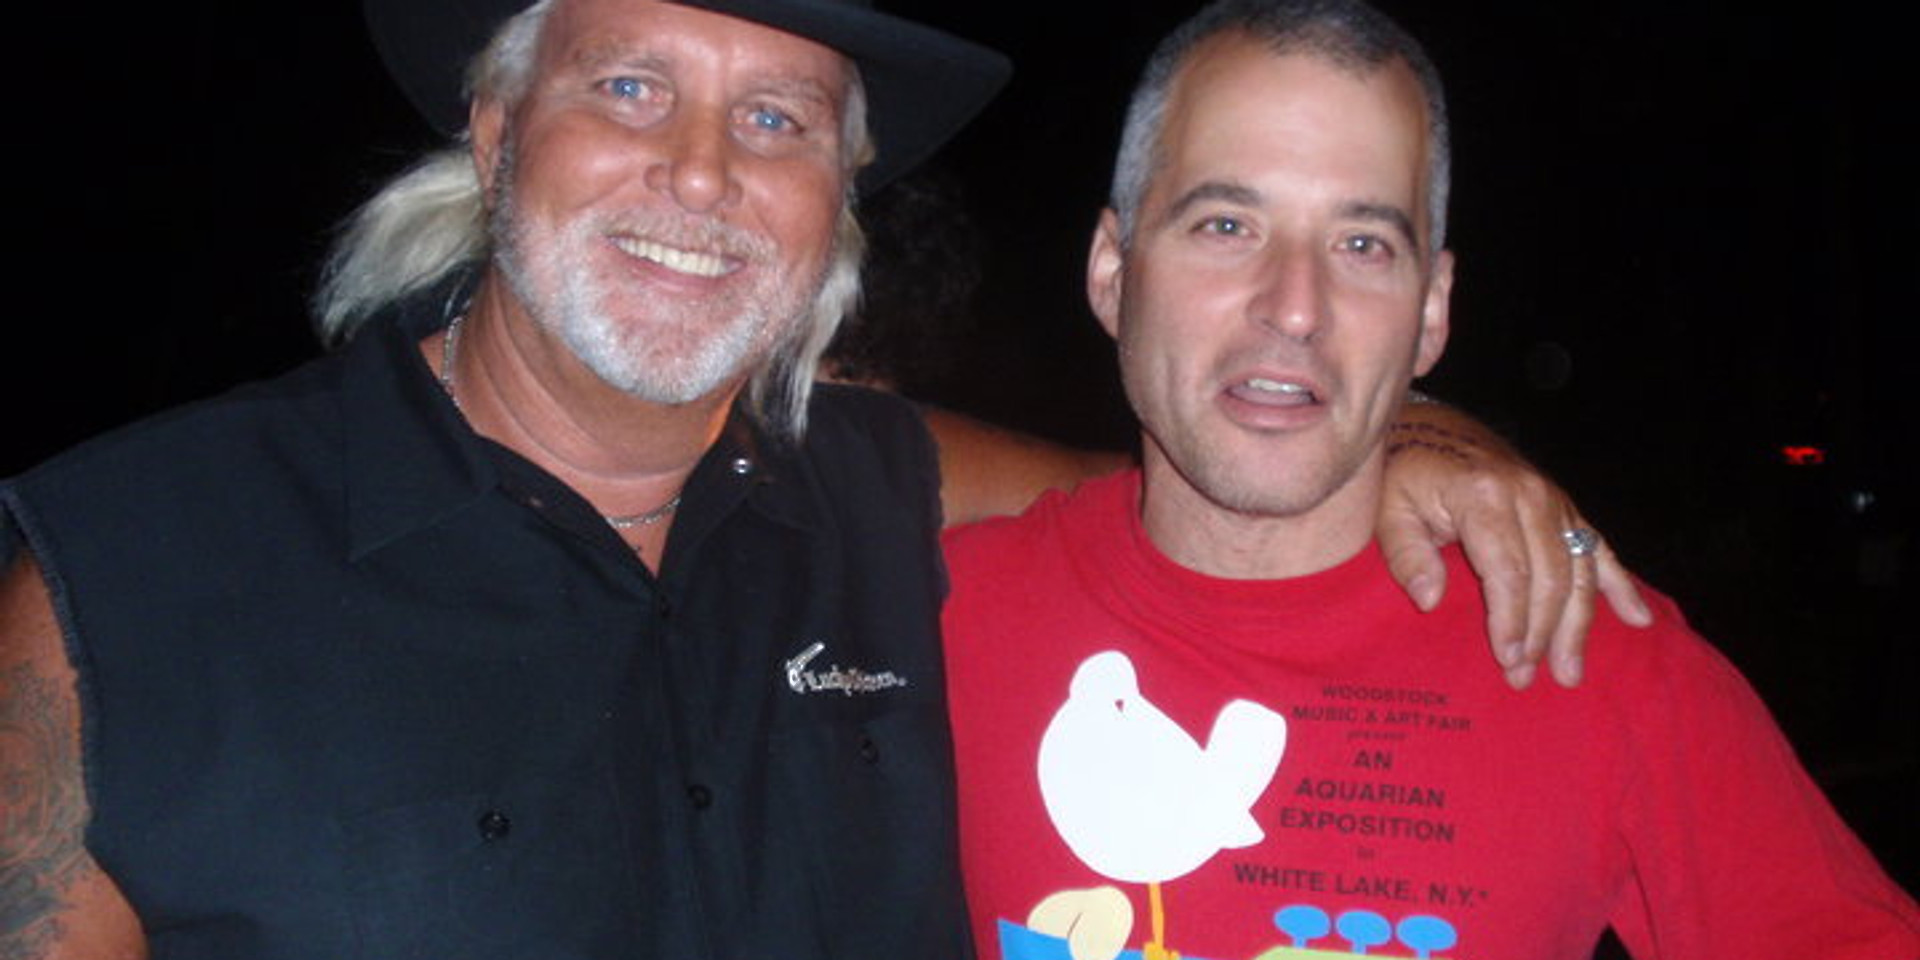 Freedon: Richie Havens